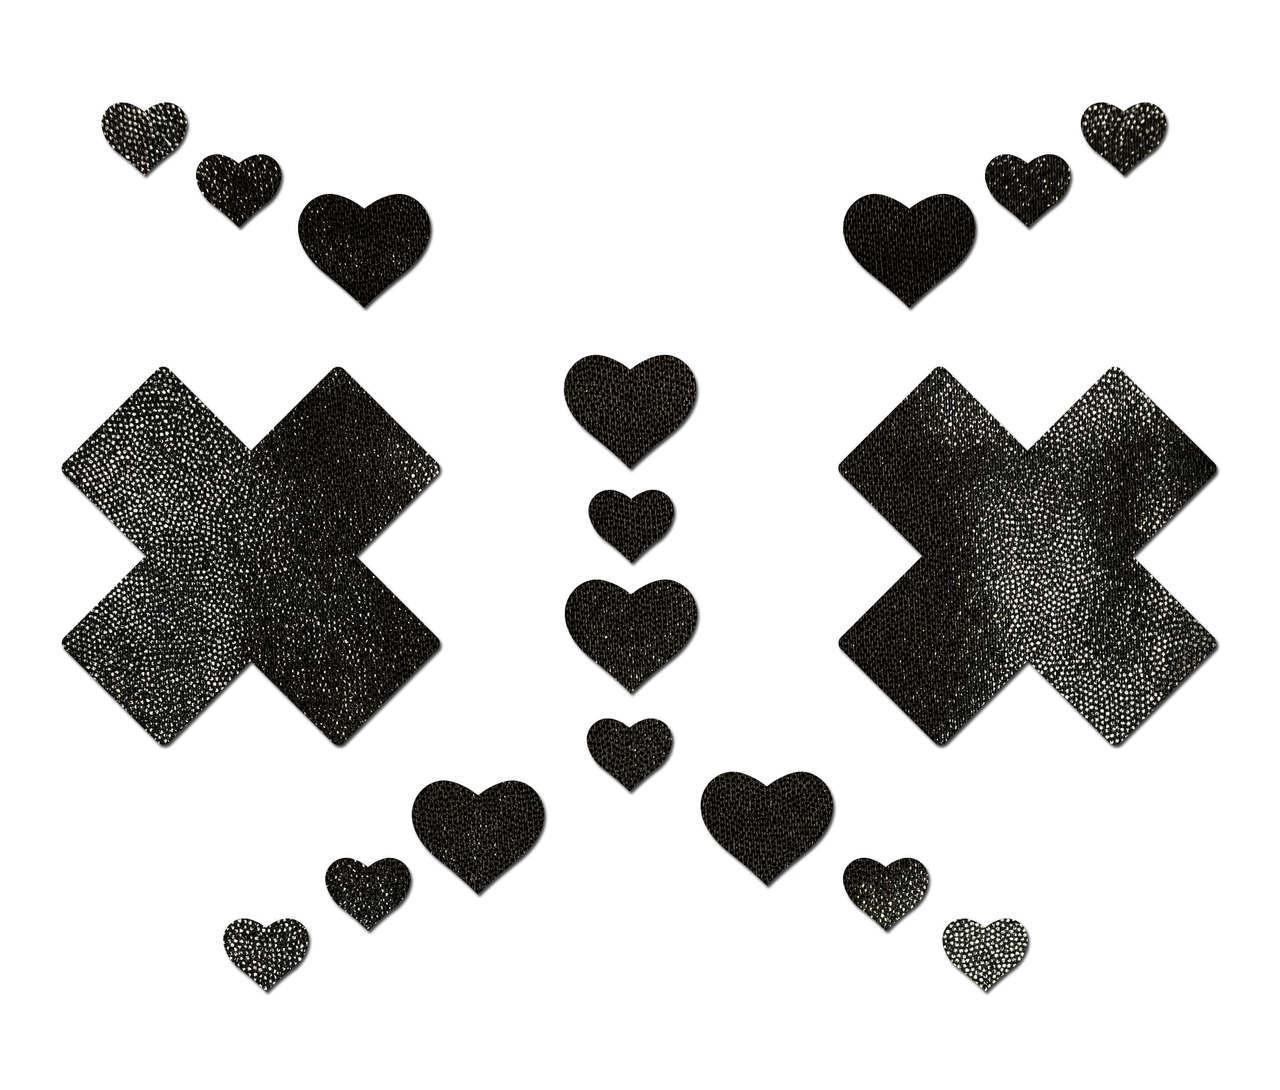 LIQUID BLACK PLUS X CROSS W/ 6 MINI HEARTS & 10 BABY HEARTS